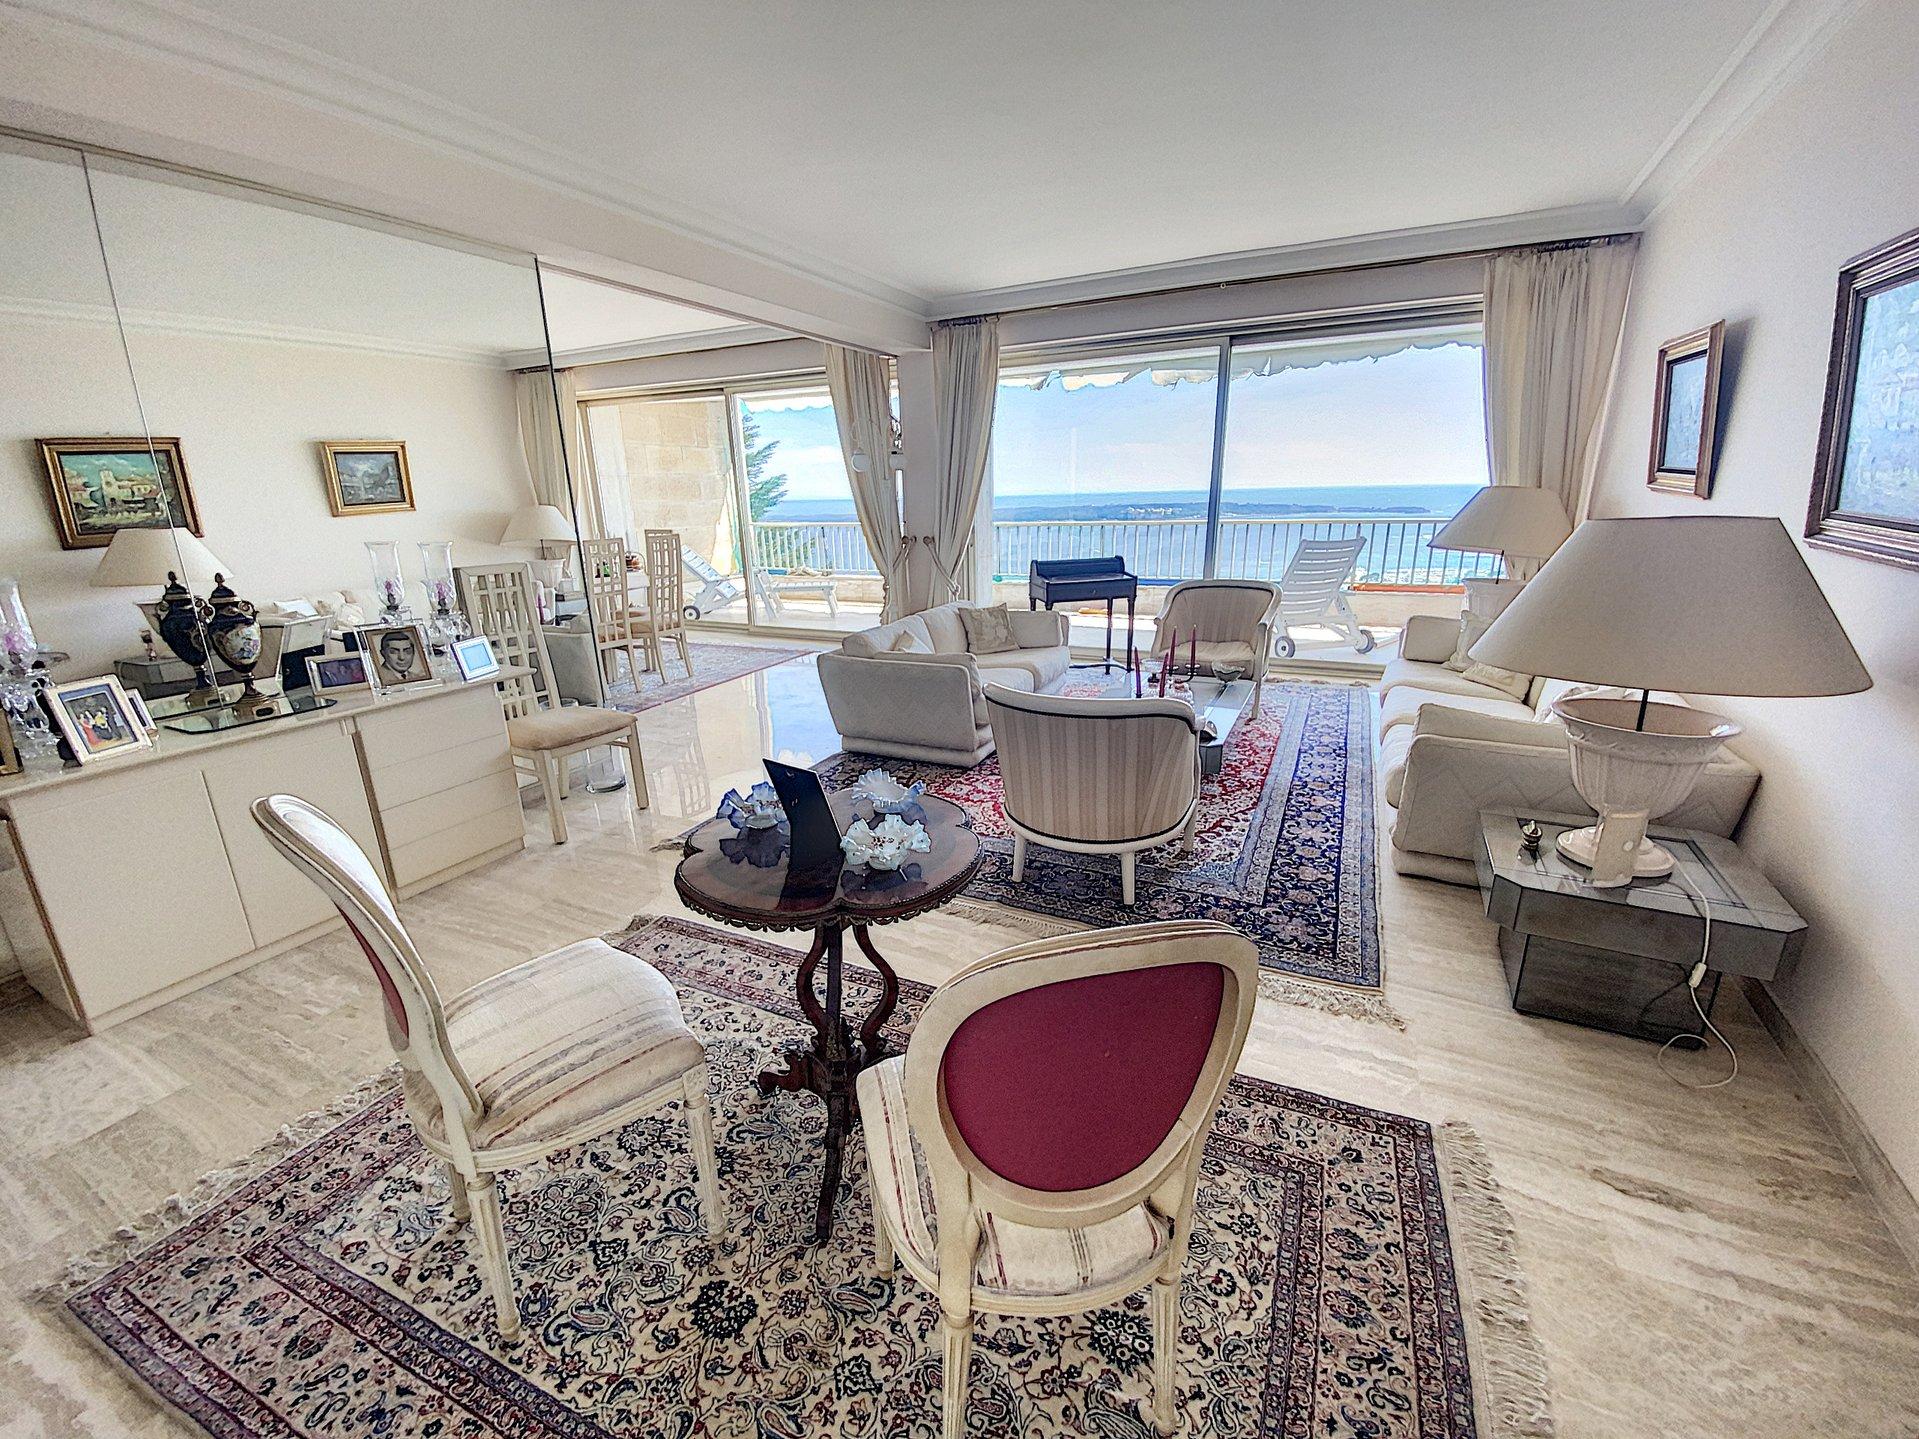 Cannes Californie 3 p 112 m2 panoramic view